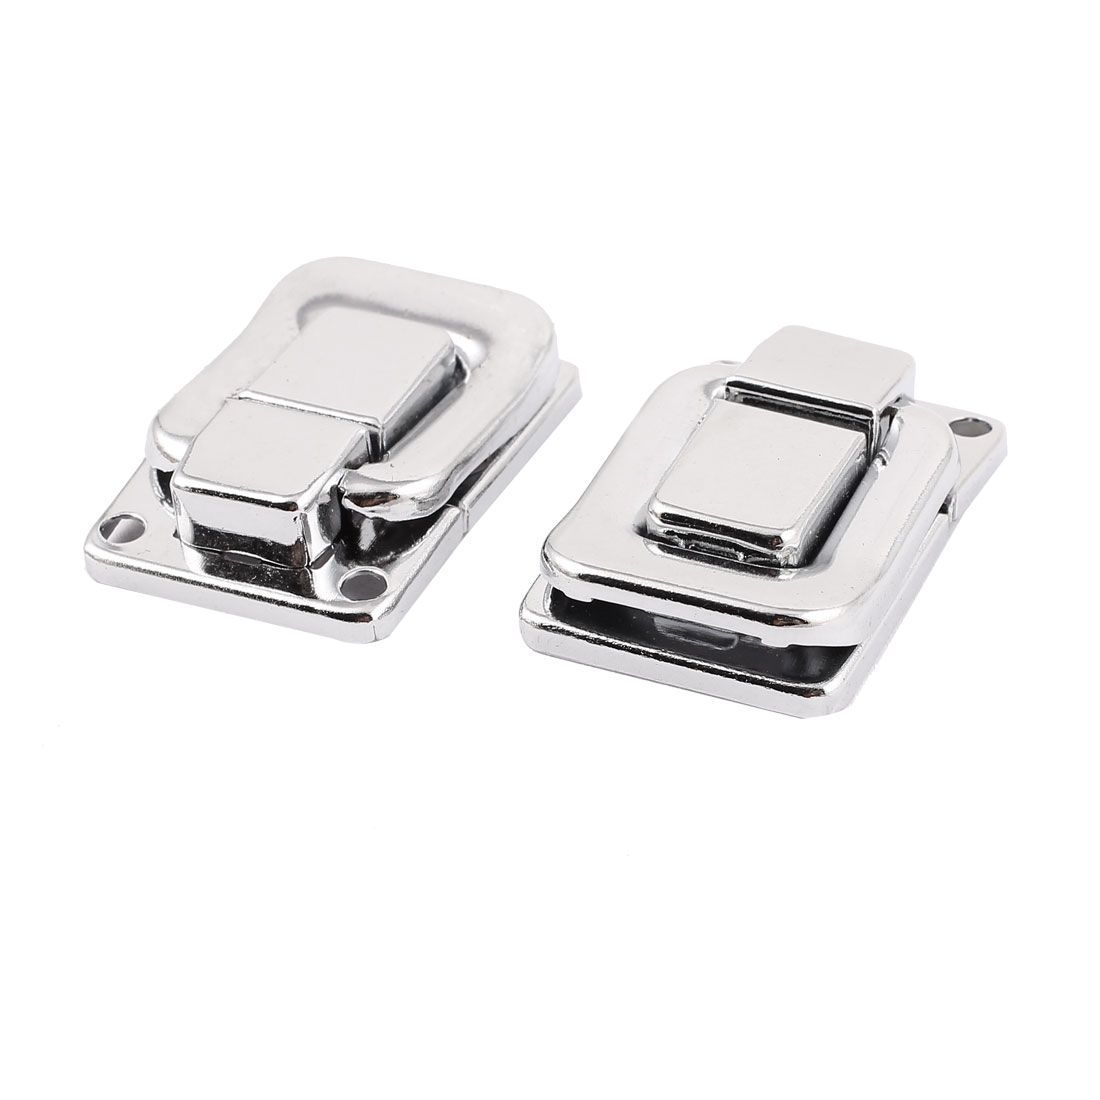 40mm x 27mm Drawbolt Closure Jewelery Box Guitar Case Suitcase Latch Silver Tone 2PCS